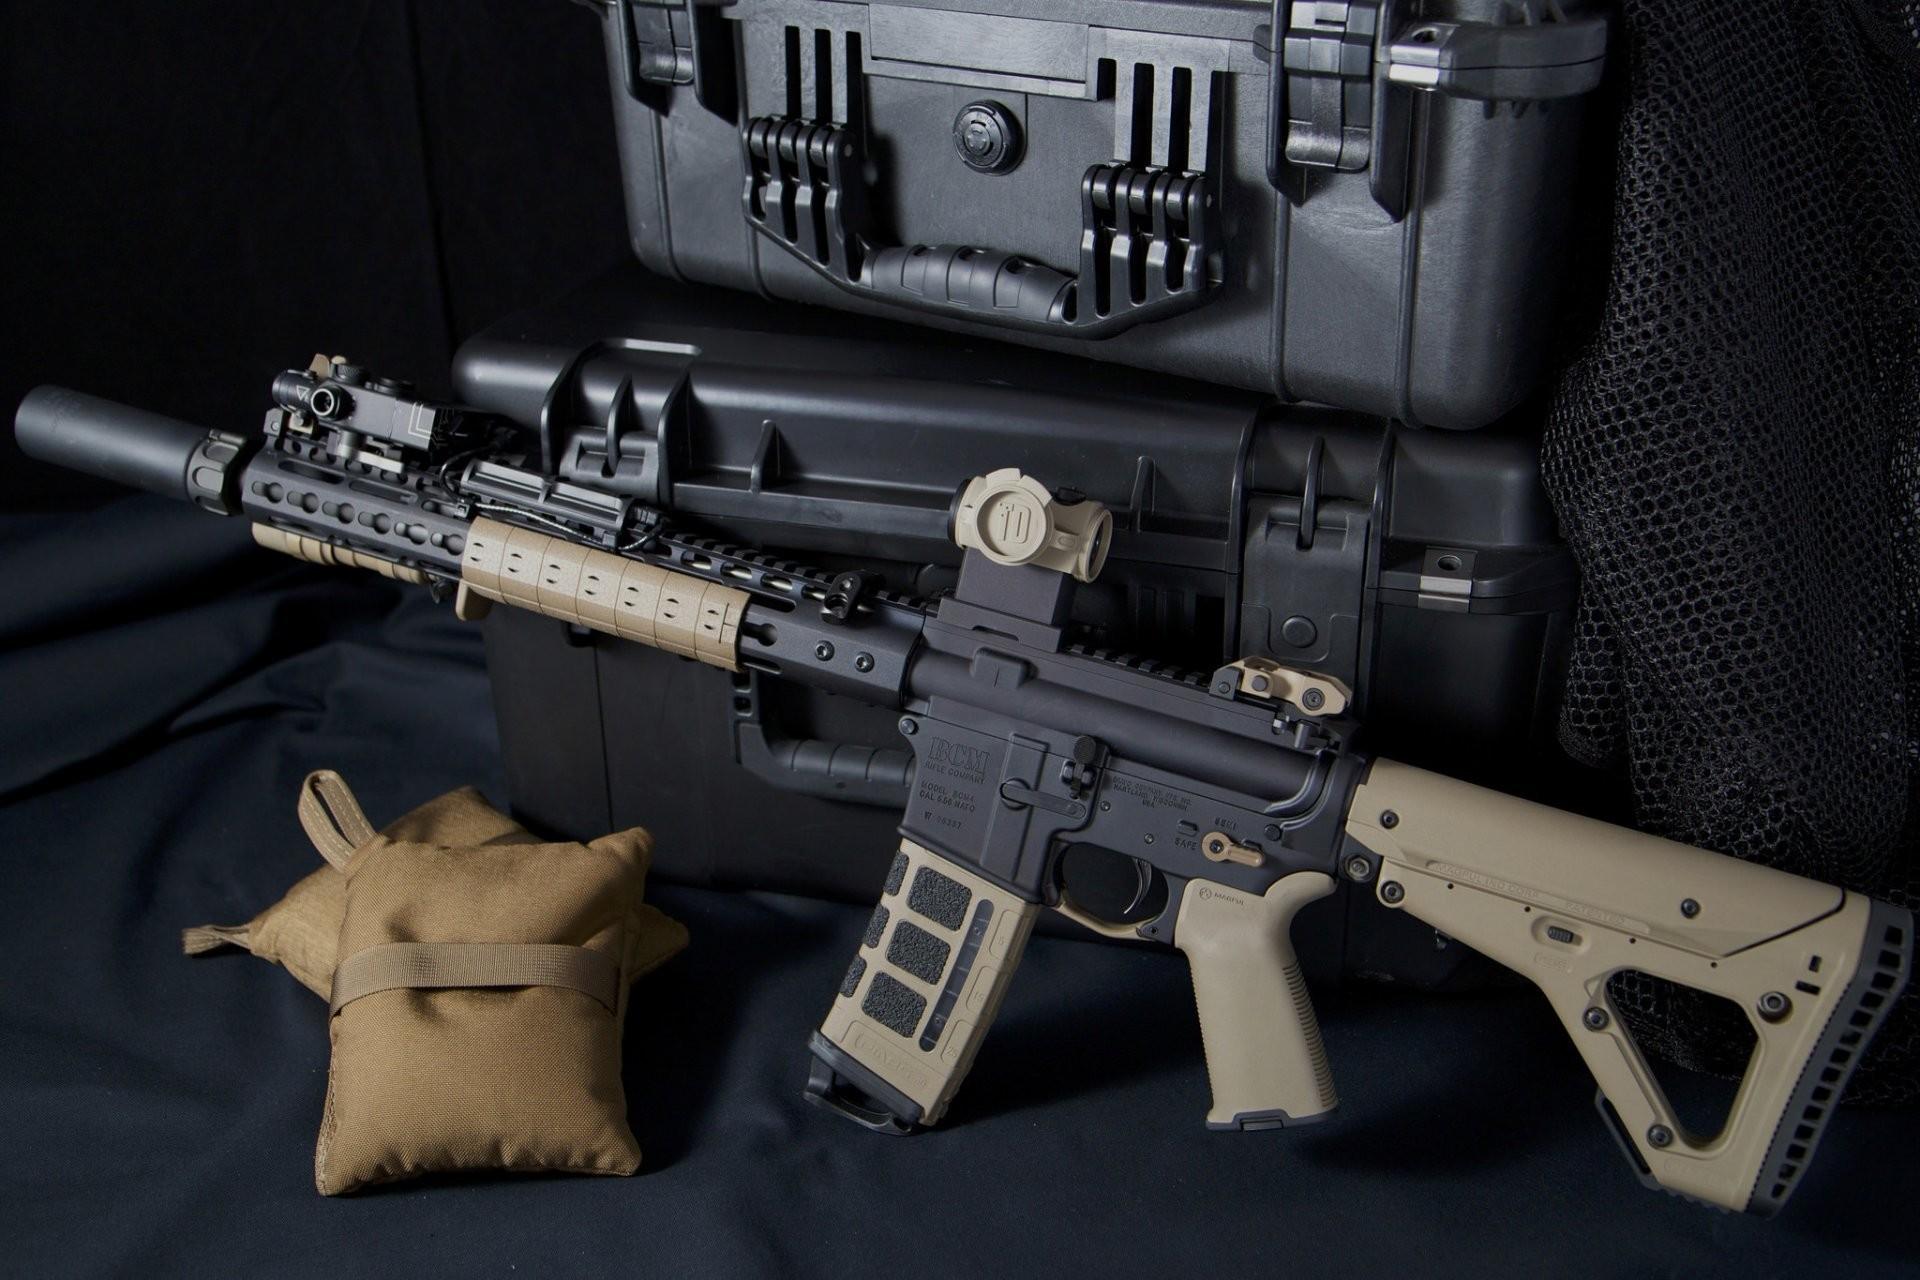 ar-15 assault rifle weapon boxes